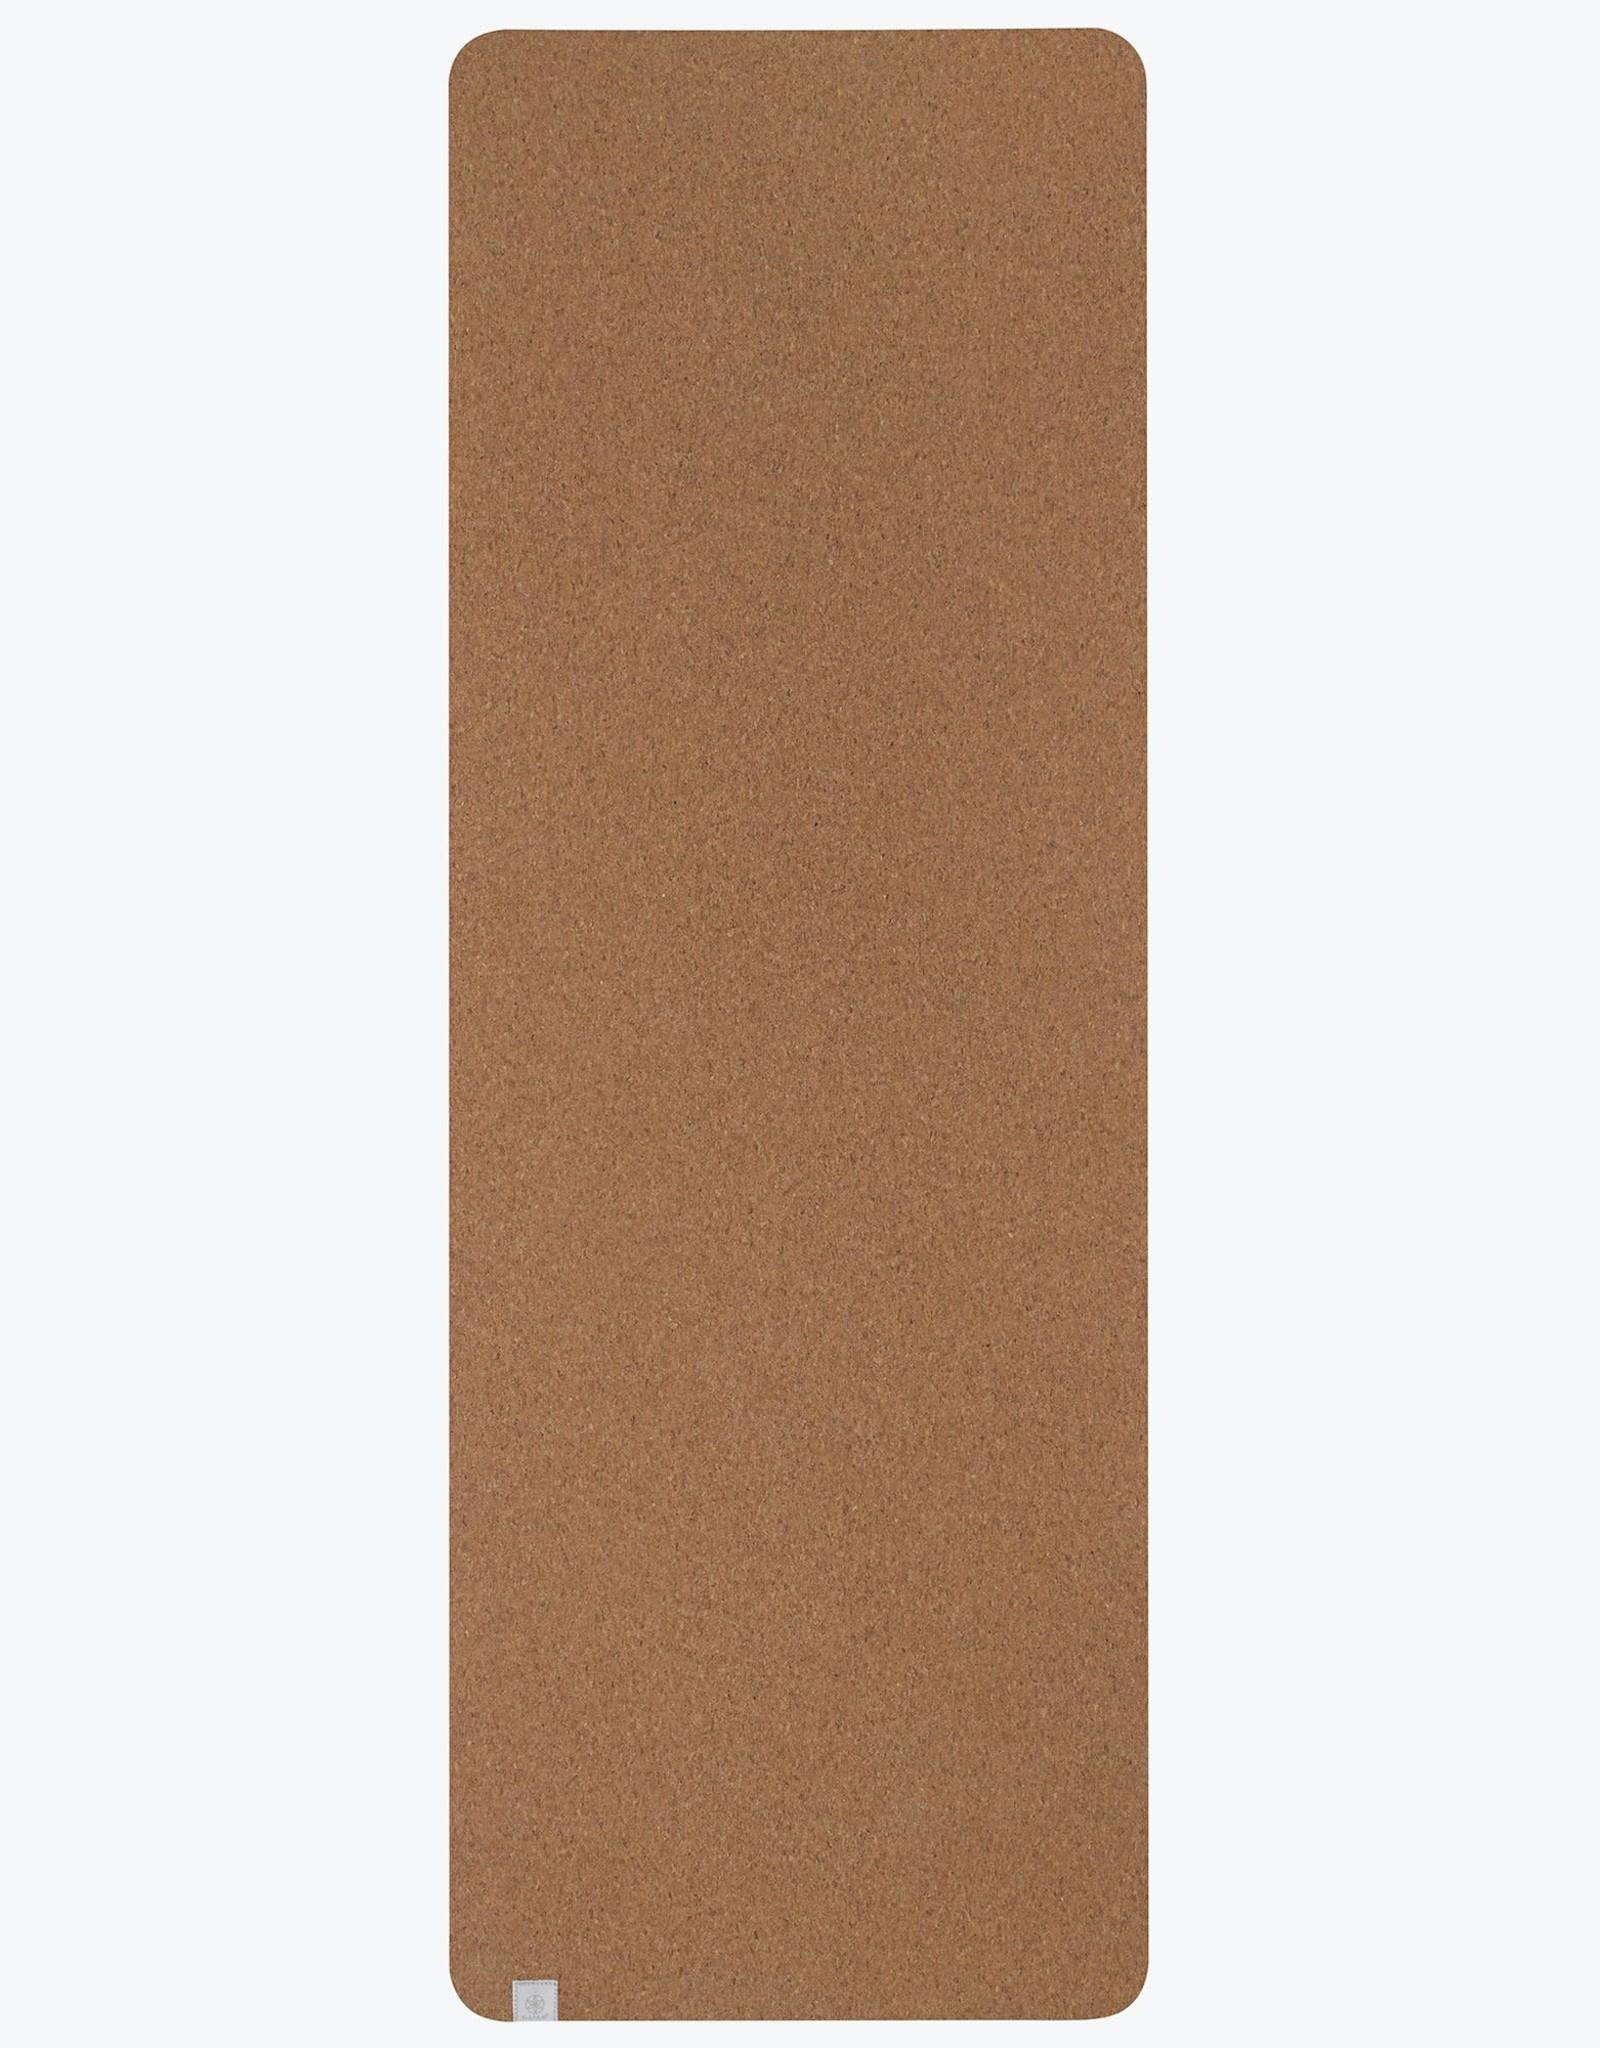 Gaiam Gaiam Performance Cork ECO Yoga Mat 5mm